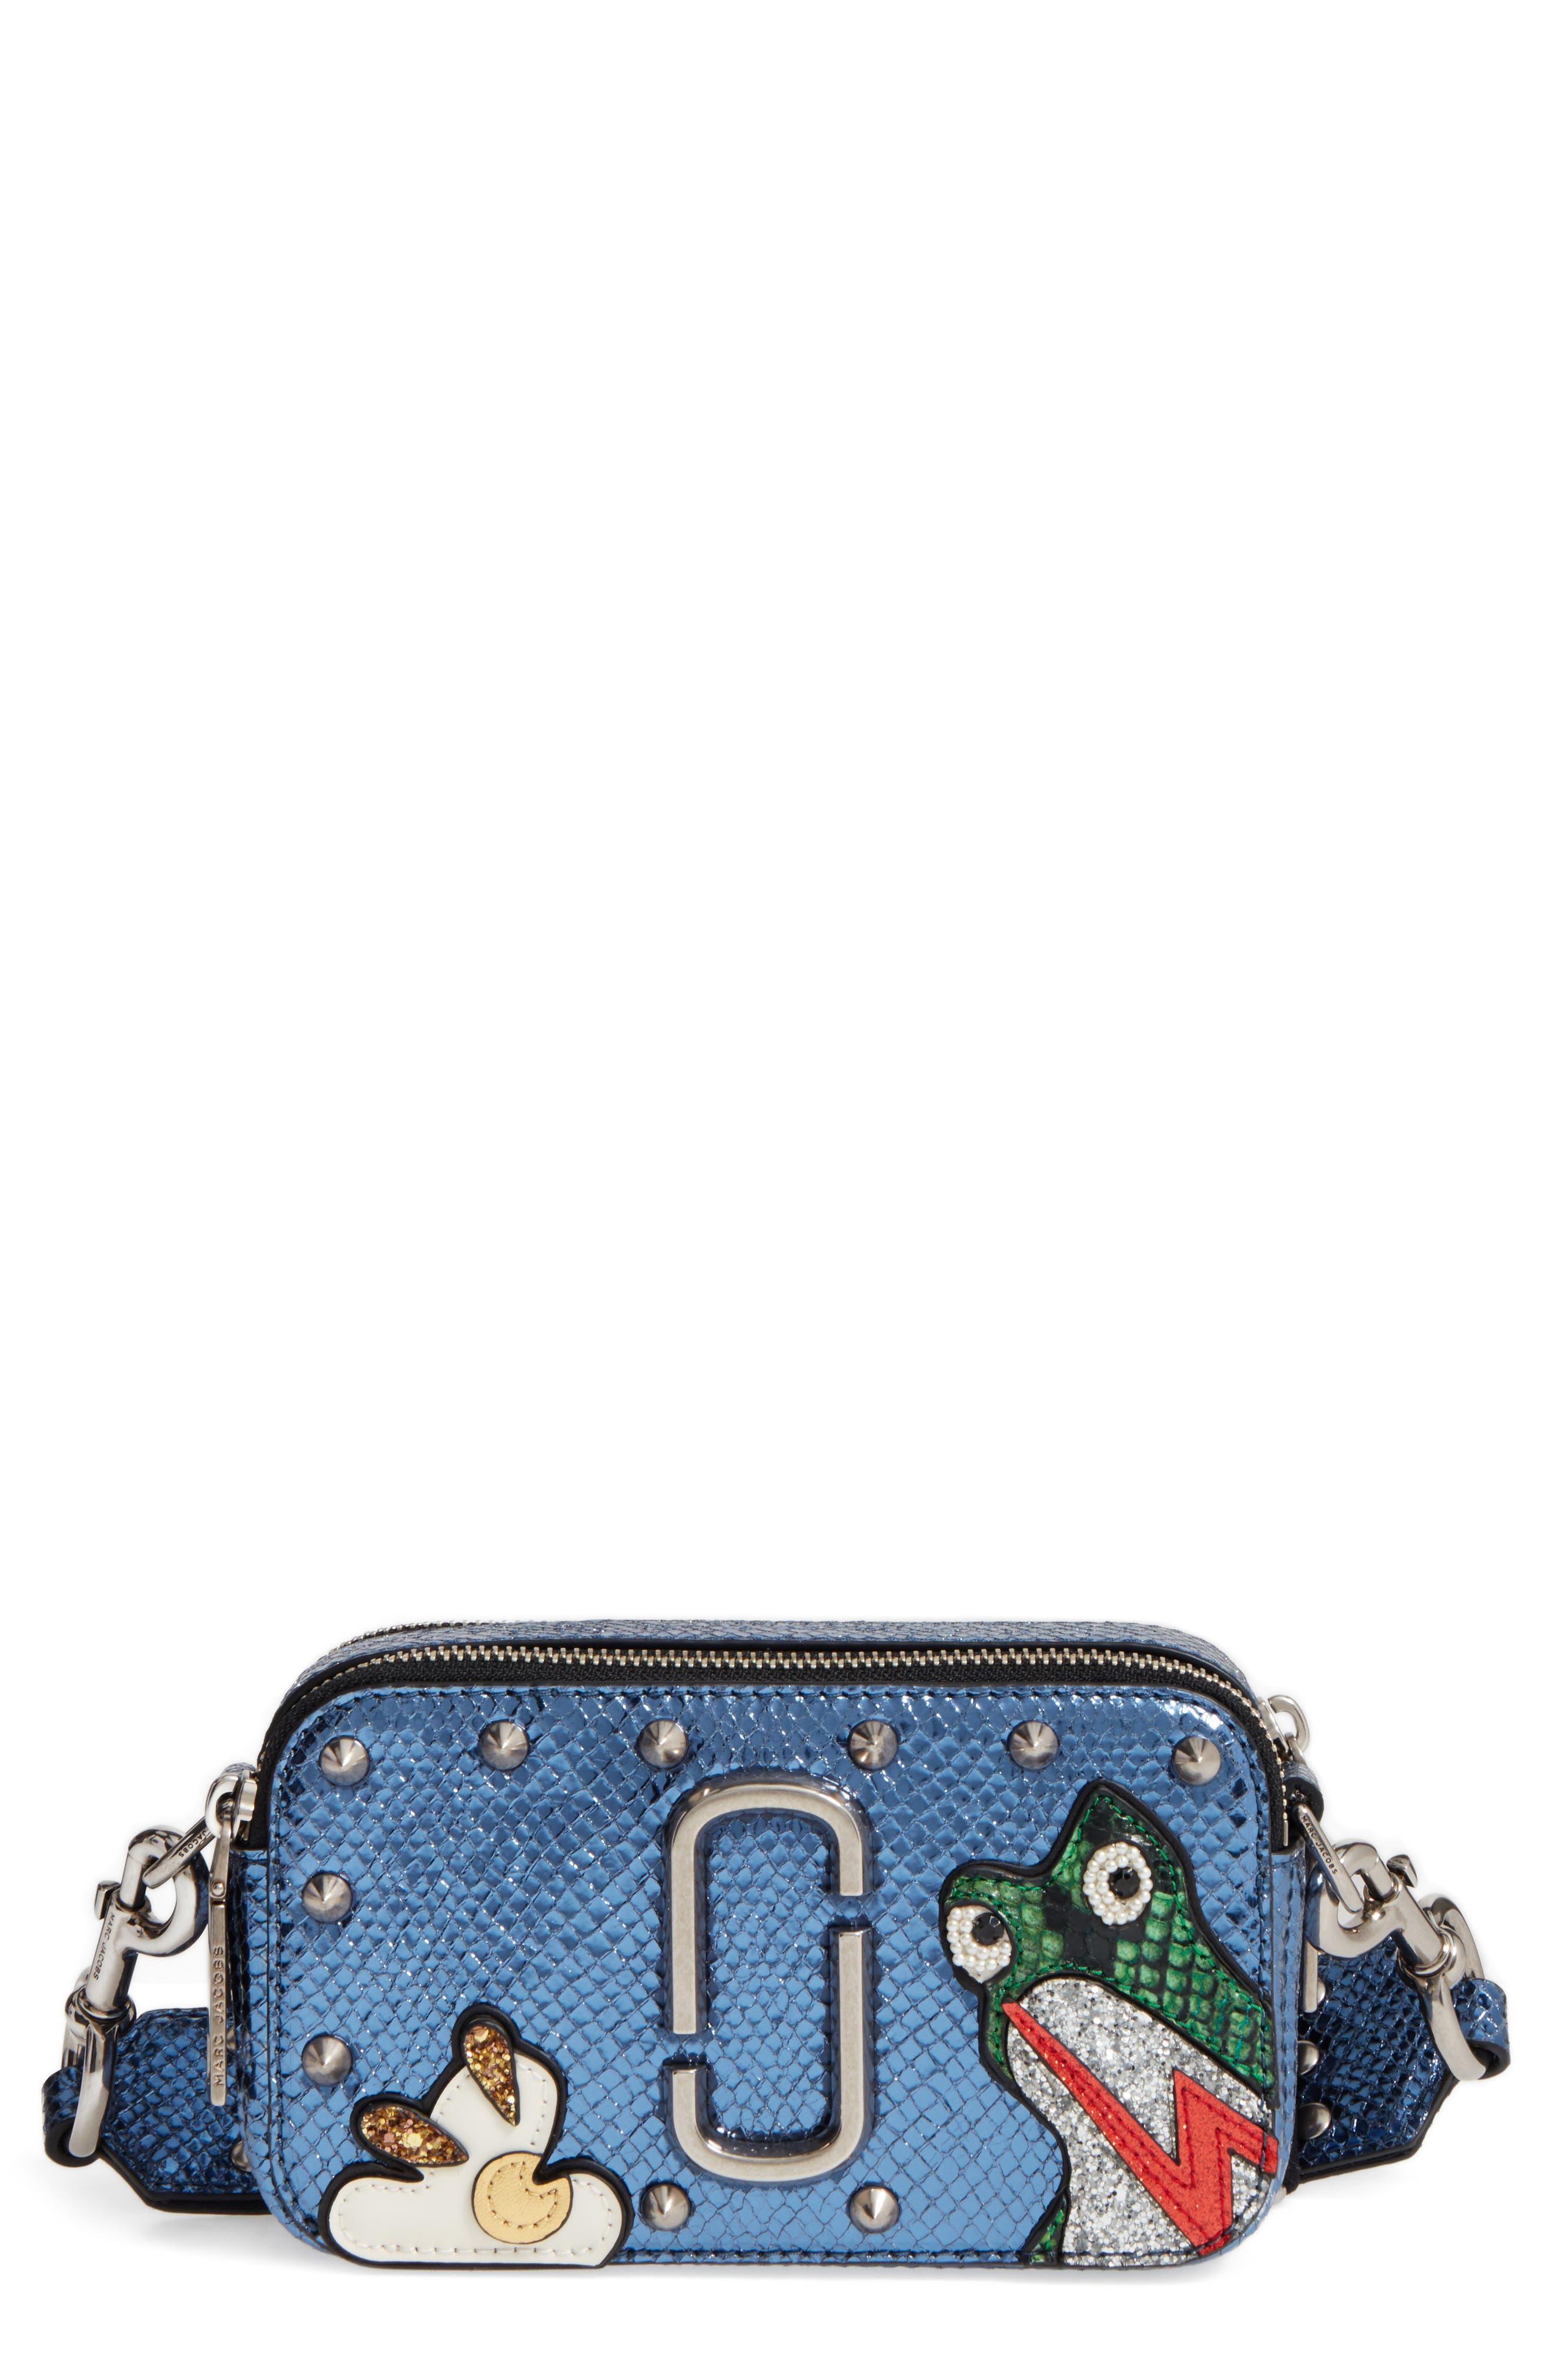 MARC JACOBS Frog Snapshot Crossbody Bag, Main, color, 410